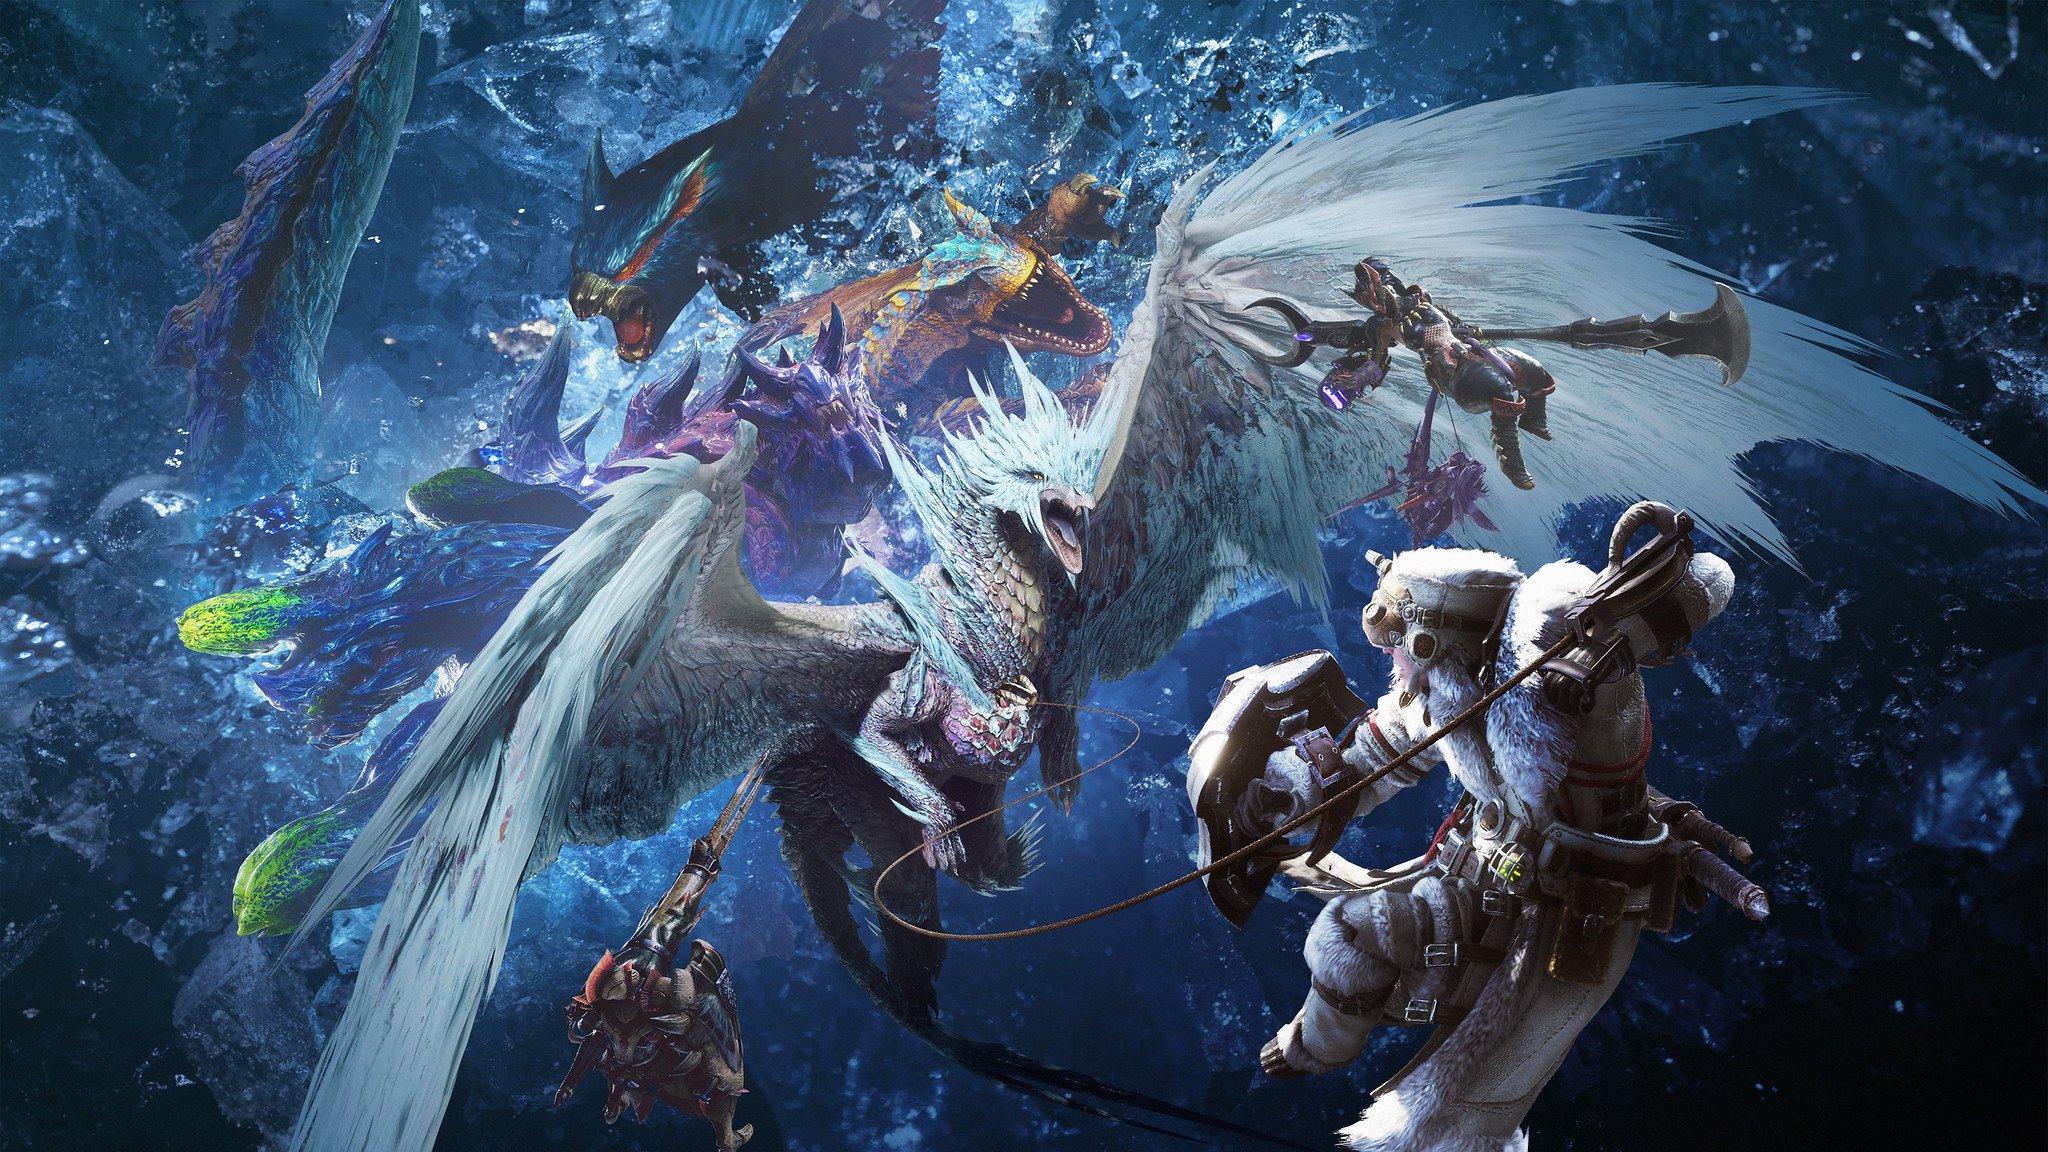 2 11 - Switch「FE風化雪月!ドラクエⅪ完全版!ポケモンソードシールド!」PS4「」